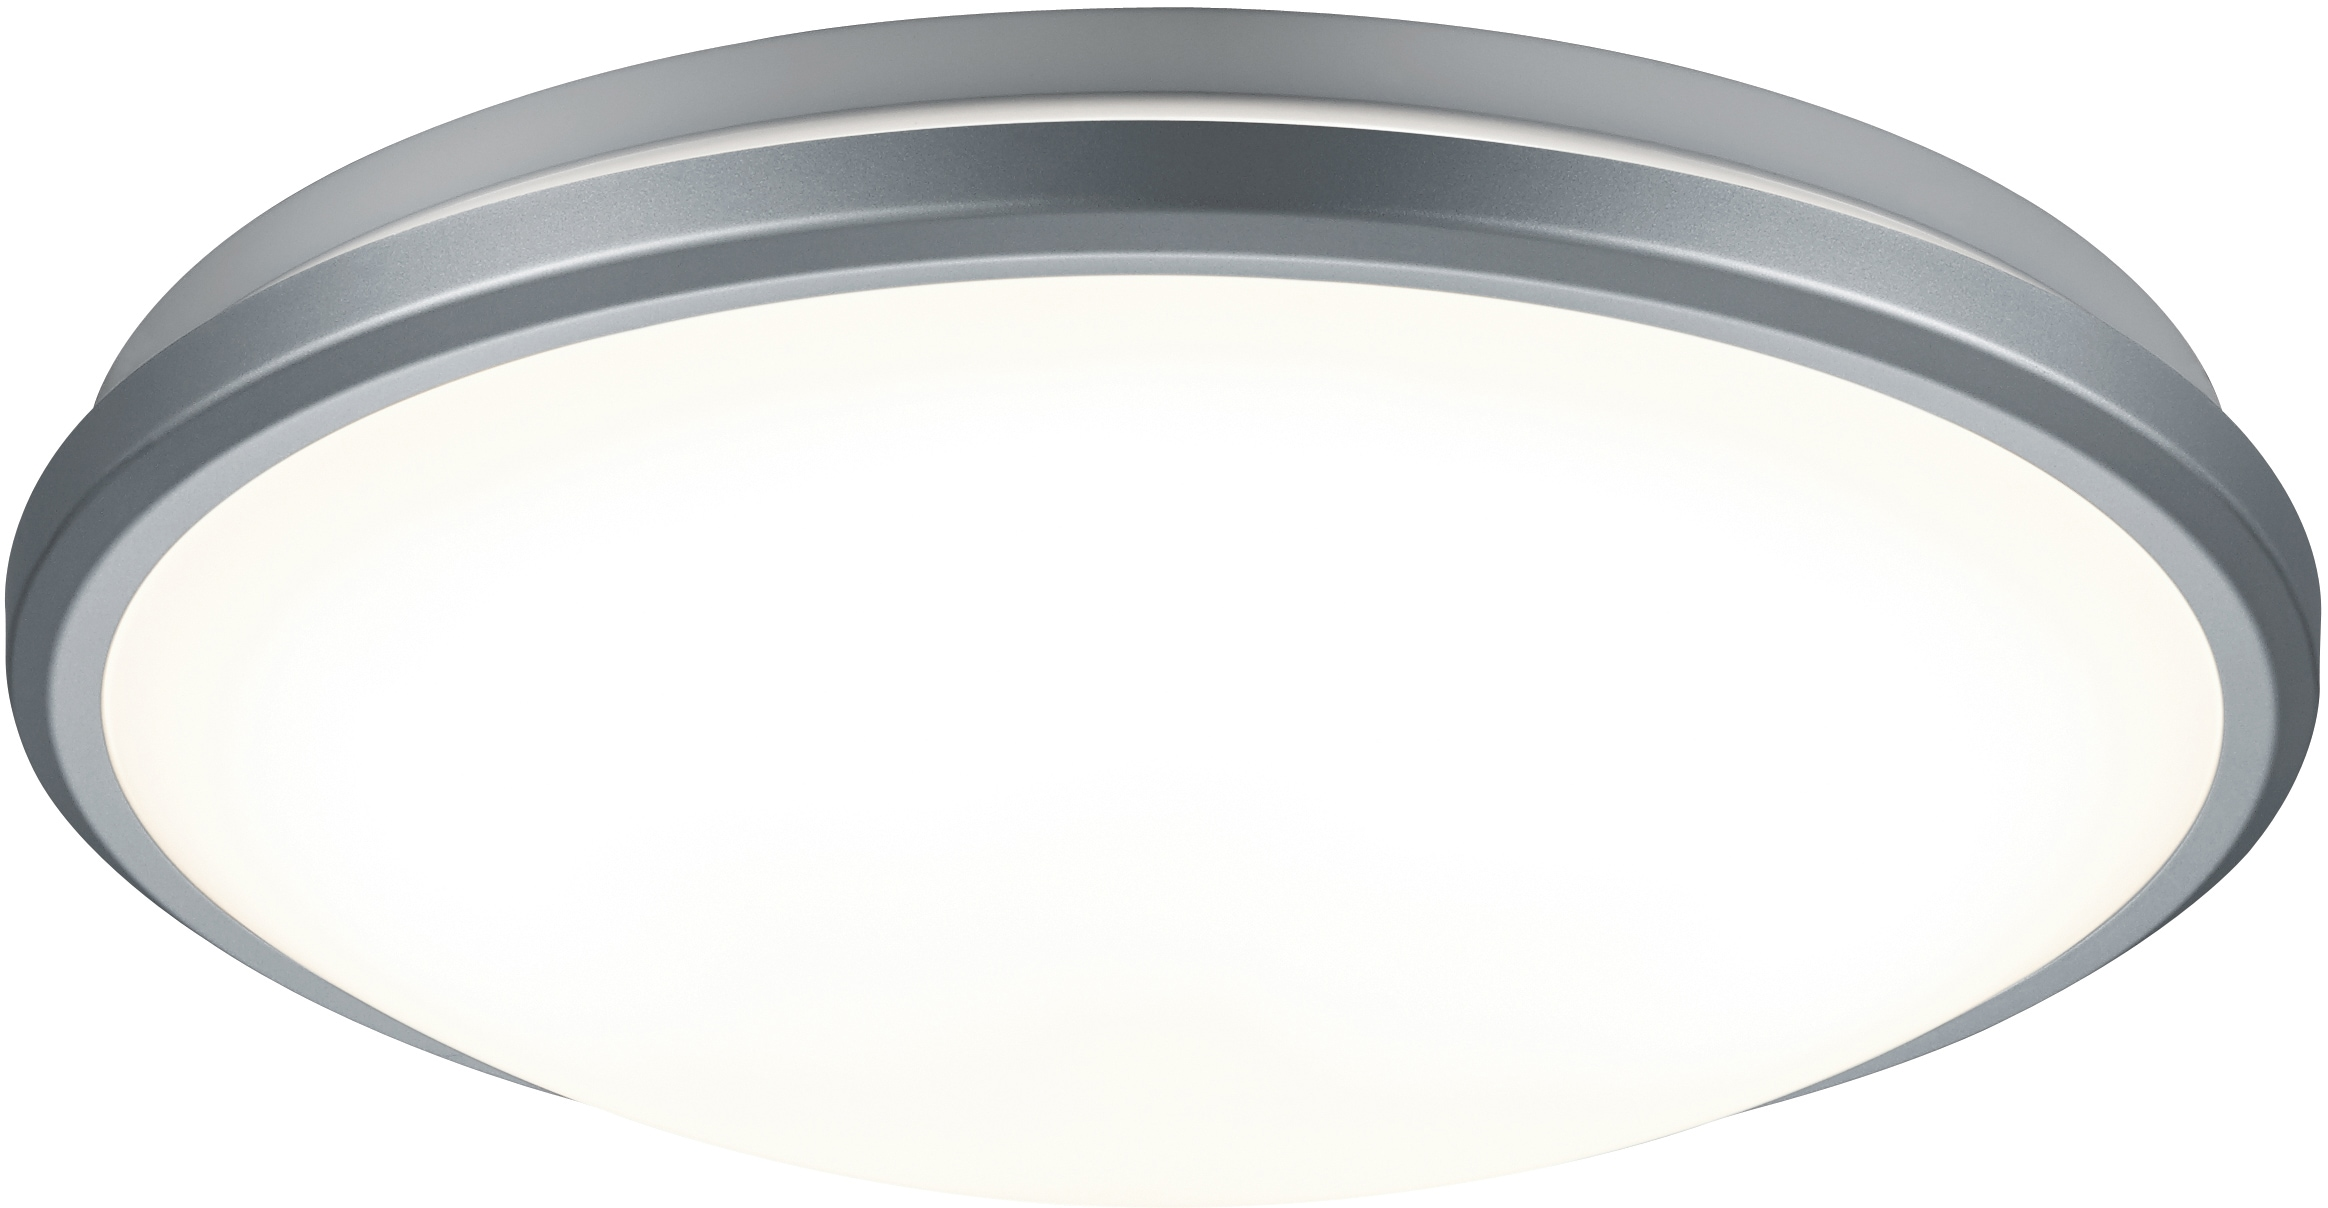 TRIO Leuchten LED Deckenleuchte ALCOR, LED-Board, LED Deckenlampe